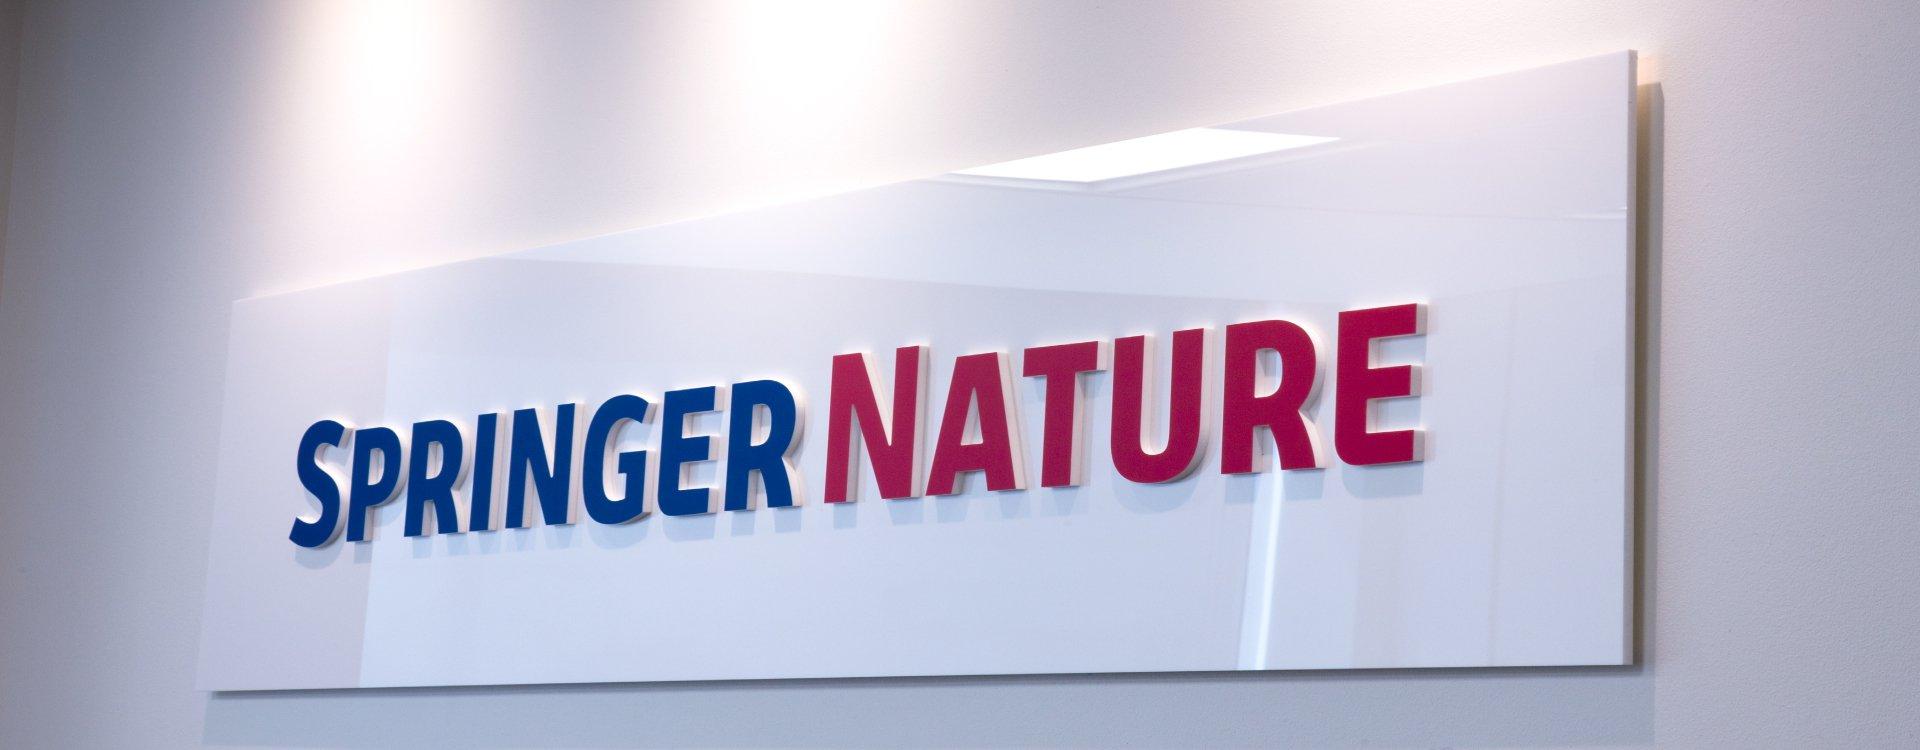 springer-nature